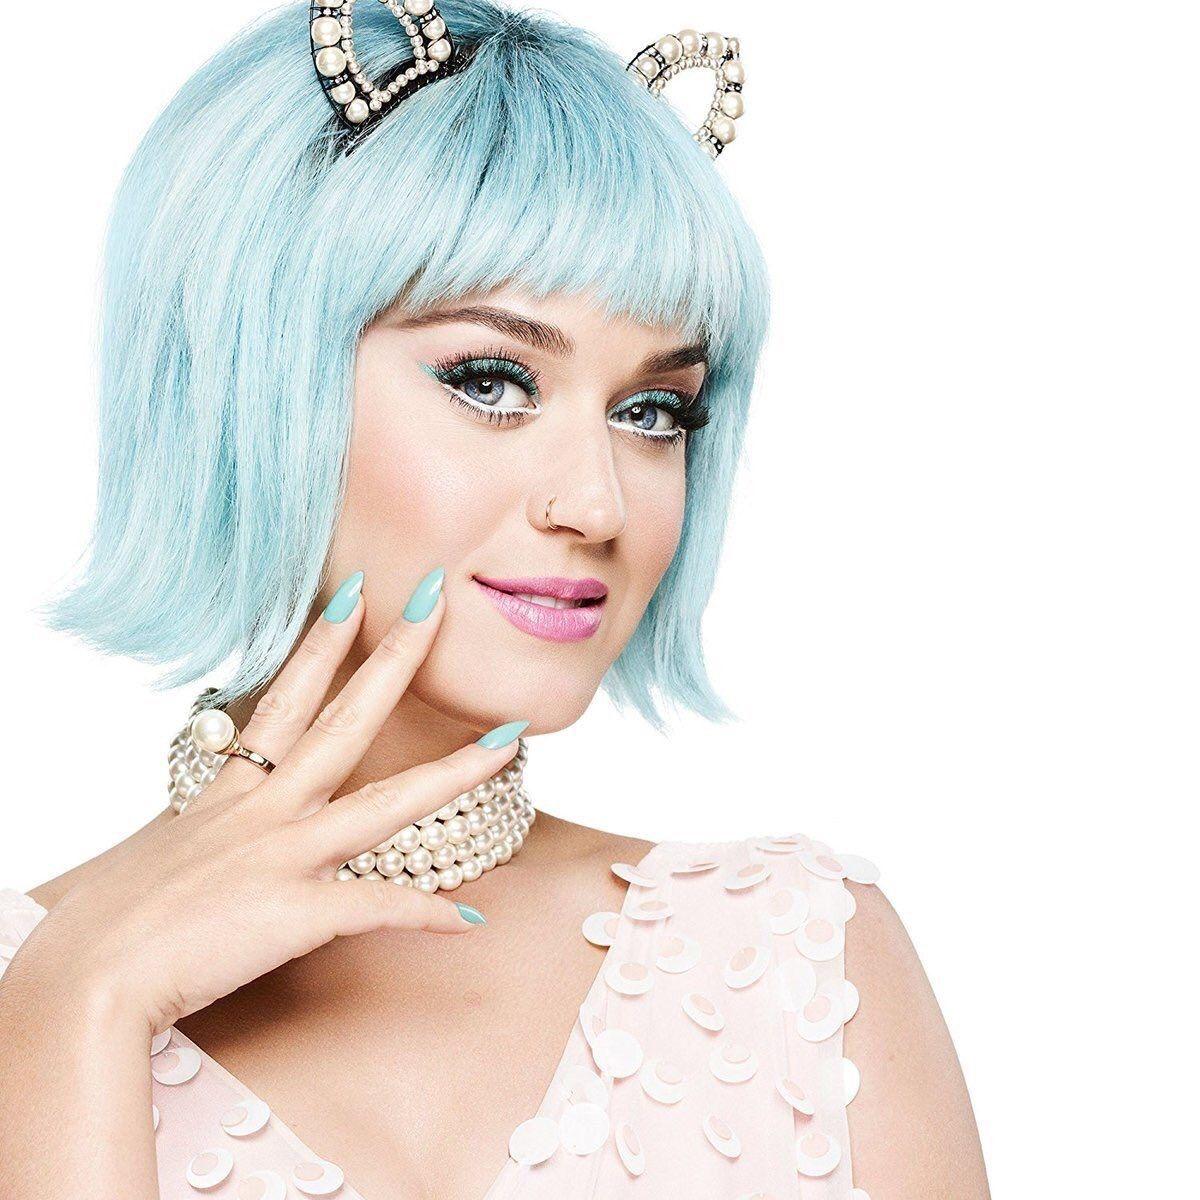 Katy Perry ♀ Katy Perry Katy Perry, Summer makeup 2017